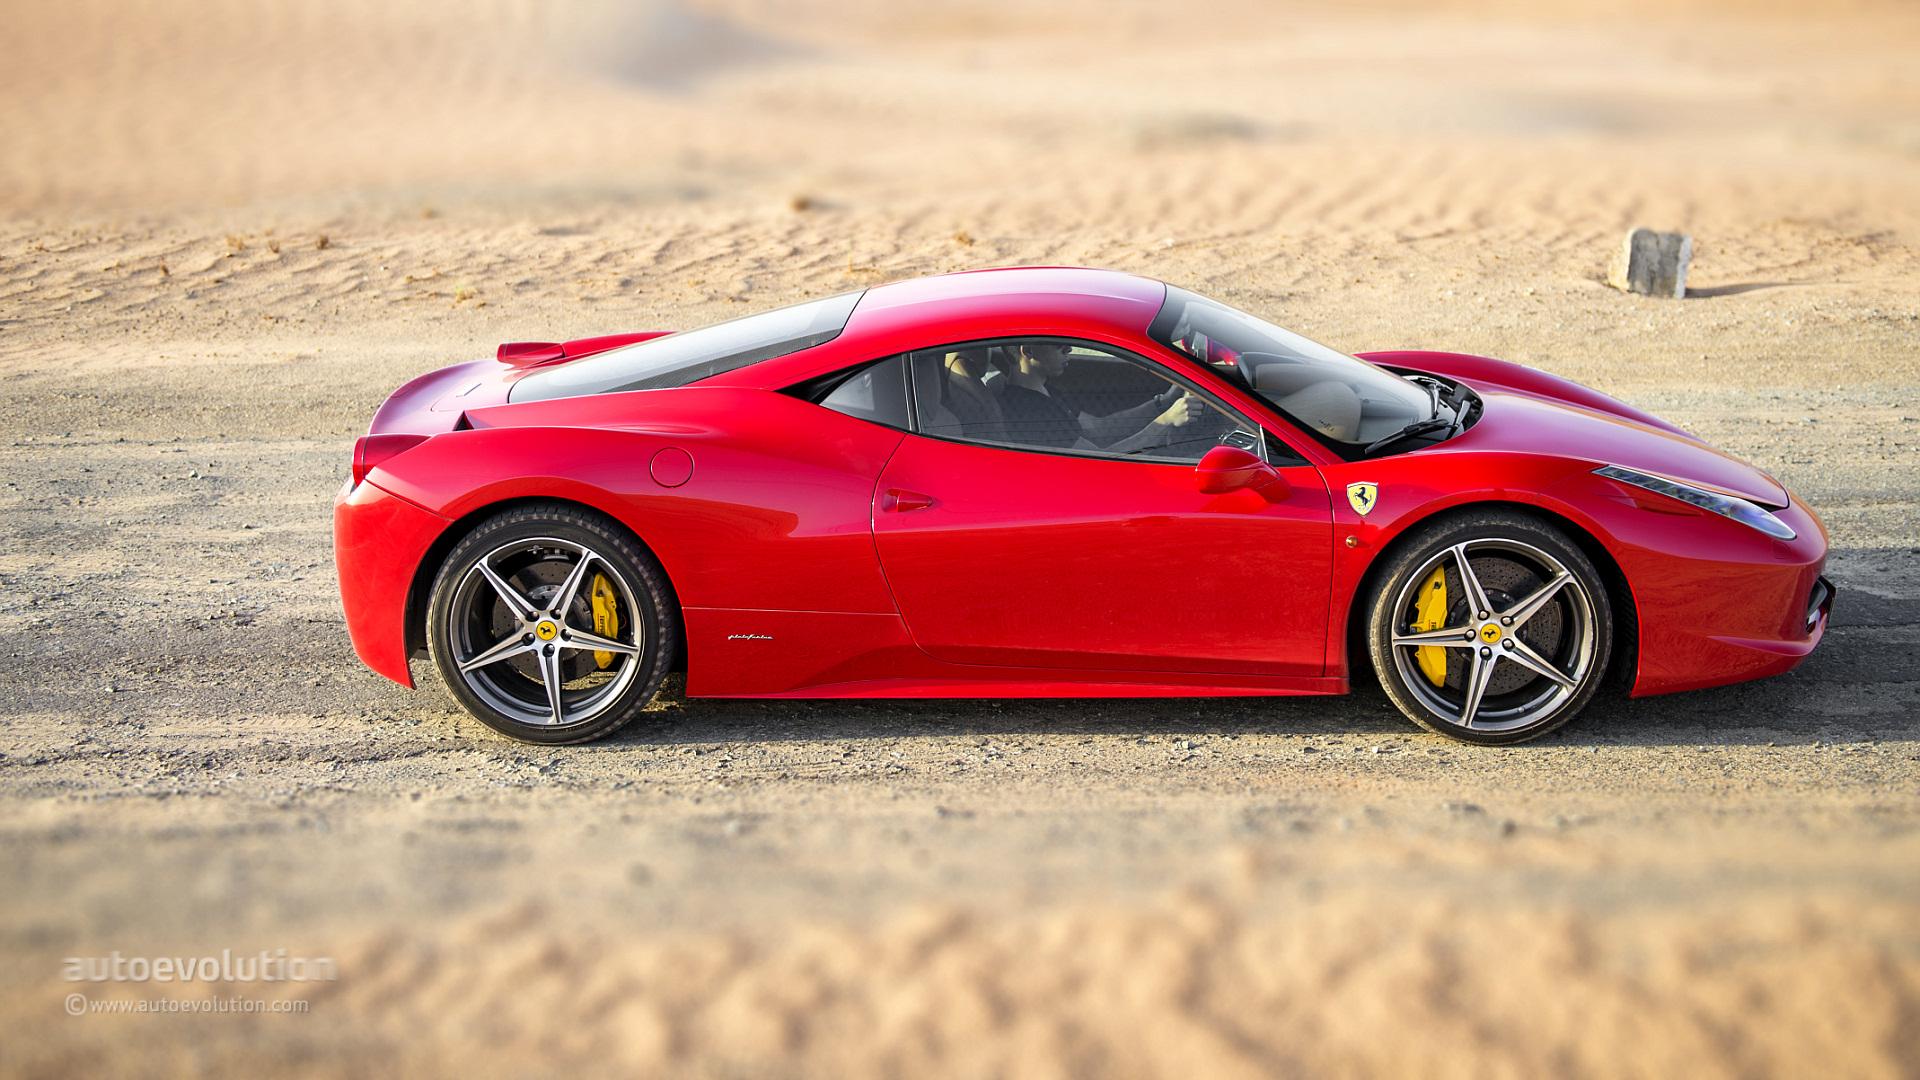 ferrari 458 italia review - autoevolution